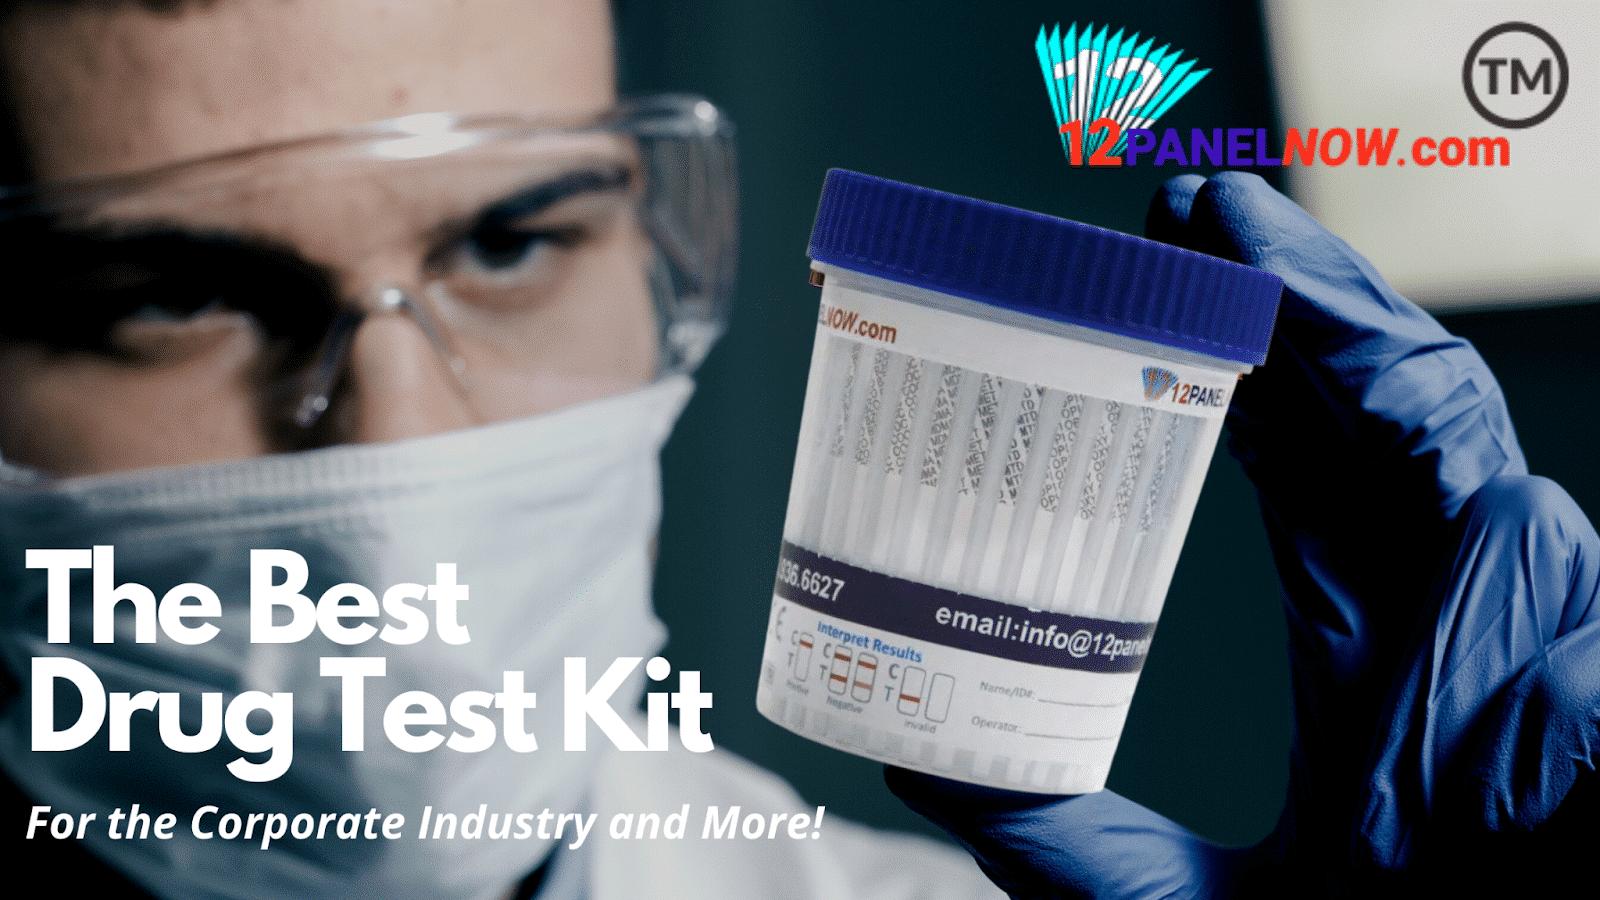 Where Can I Buy a Drug Test Kit?